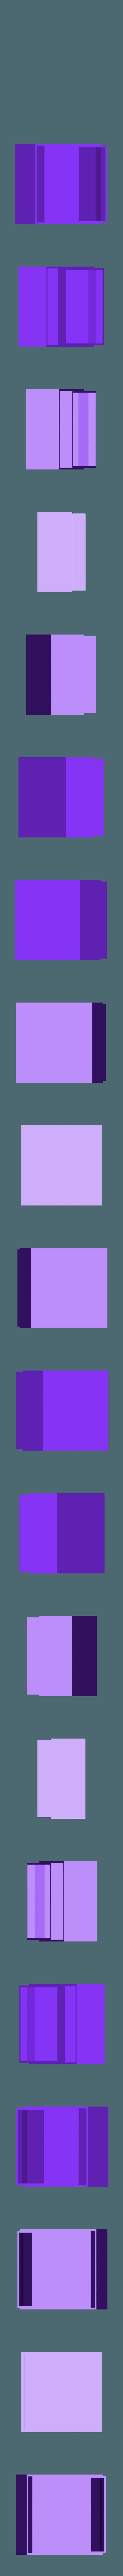 salt cellar bottom.stl Download free STL file Salt cellar/container • 3D printable template, NikodemBartnik